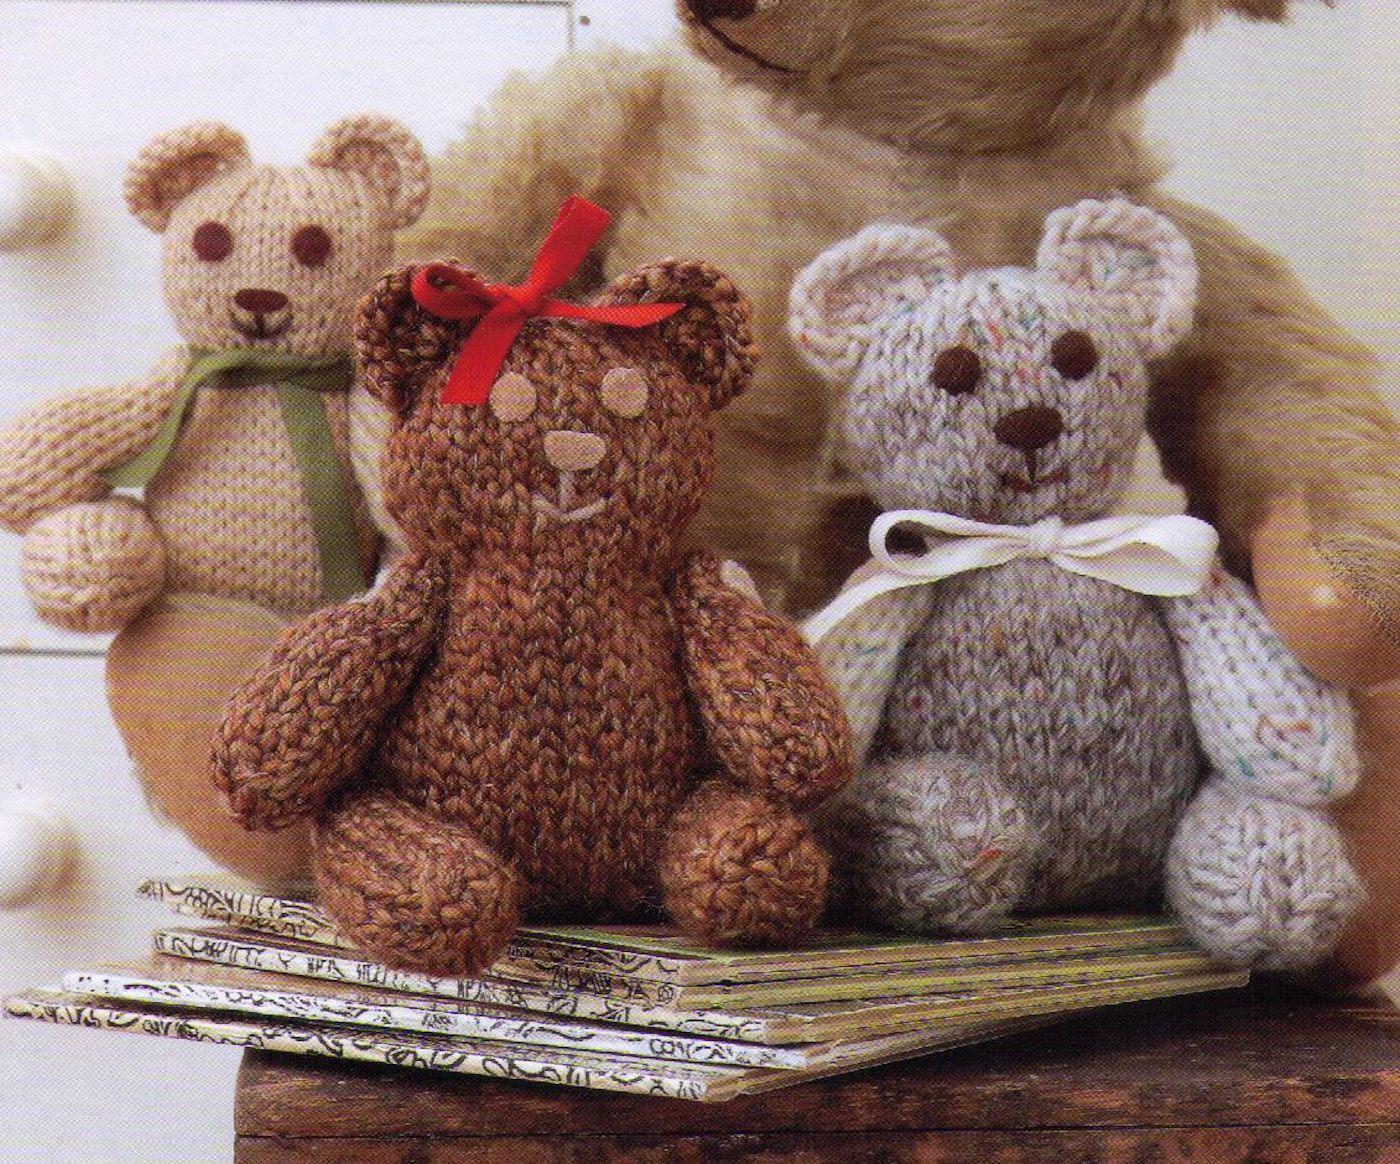 PDF Small Teddy Bear Pattern Knitting Knit Crochet Toy  #knit #knitpattern #knitteddybear #knitted #knitting #knittingpattern #pattern #teddybear #teddybearpattern #toypattern:separator: #crochetteddybears